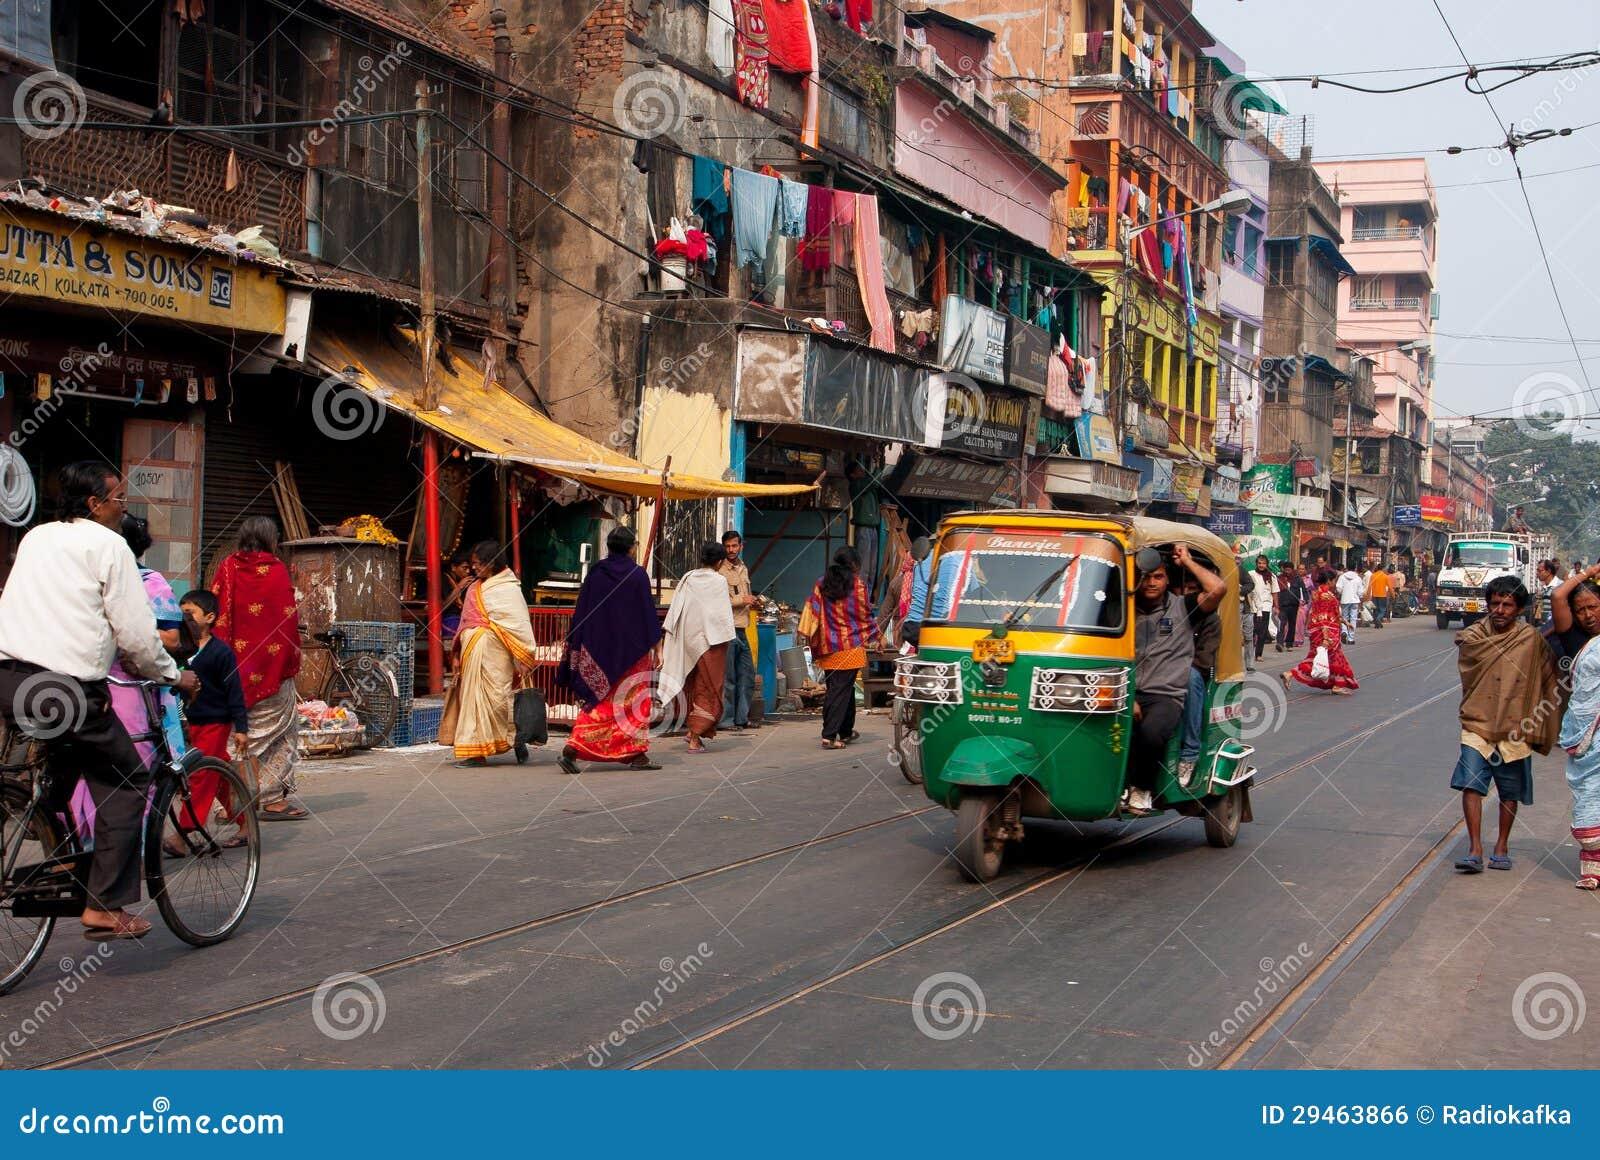 Auto Rickshaw Stock Images Download 1 805 Photos